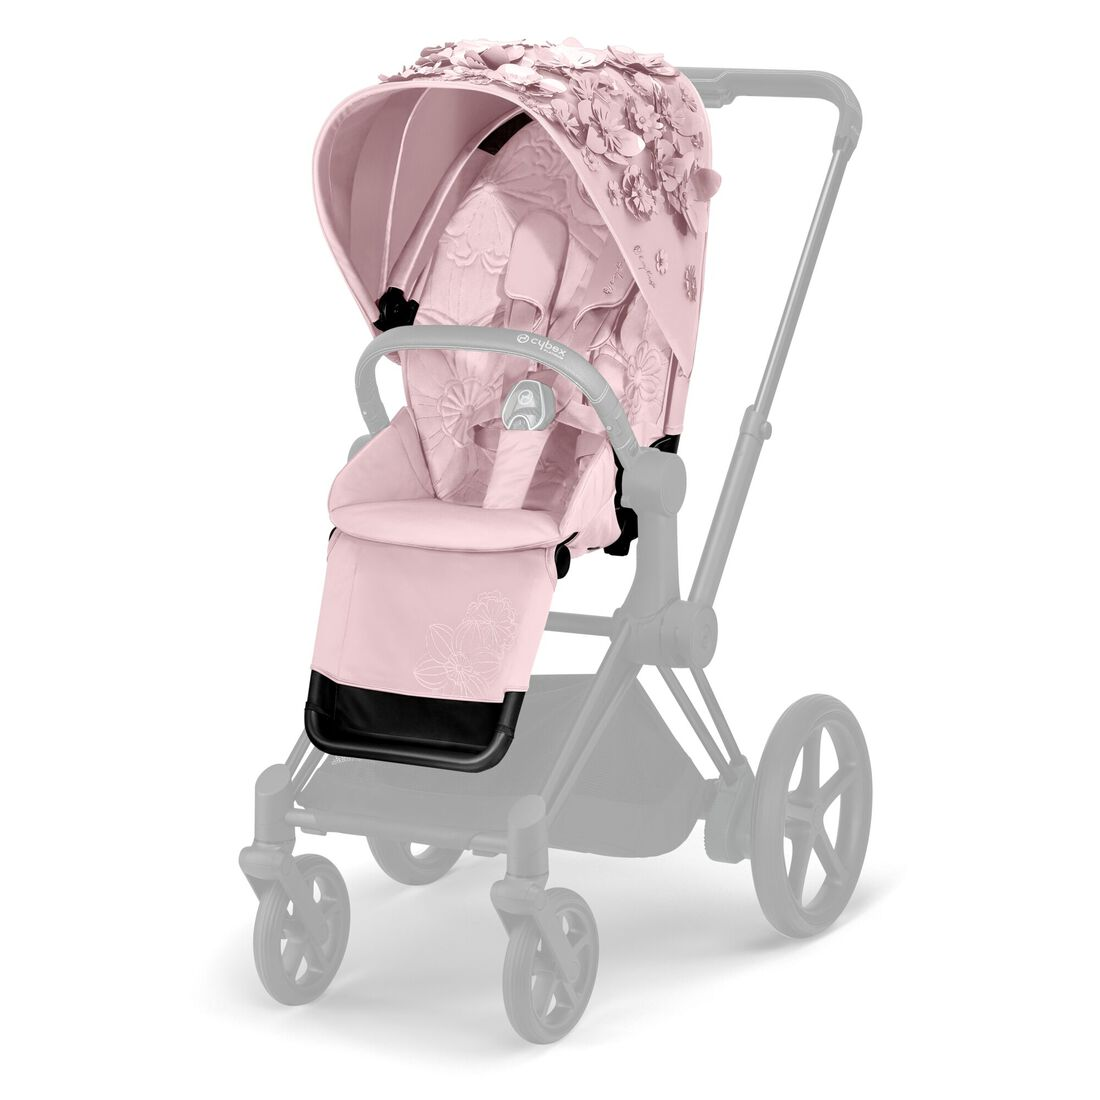 CYBEX Priam Sitzpaket - Simply Flowers Pink in Pale Blush large Bild 1